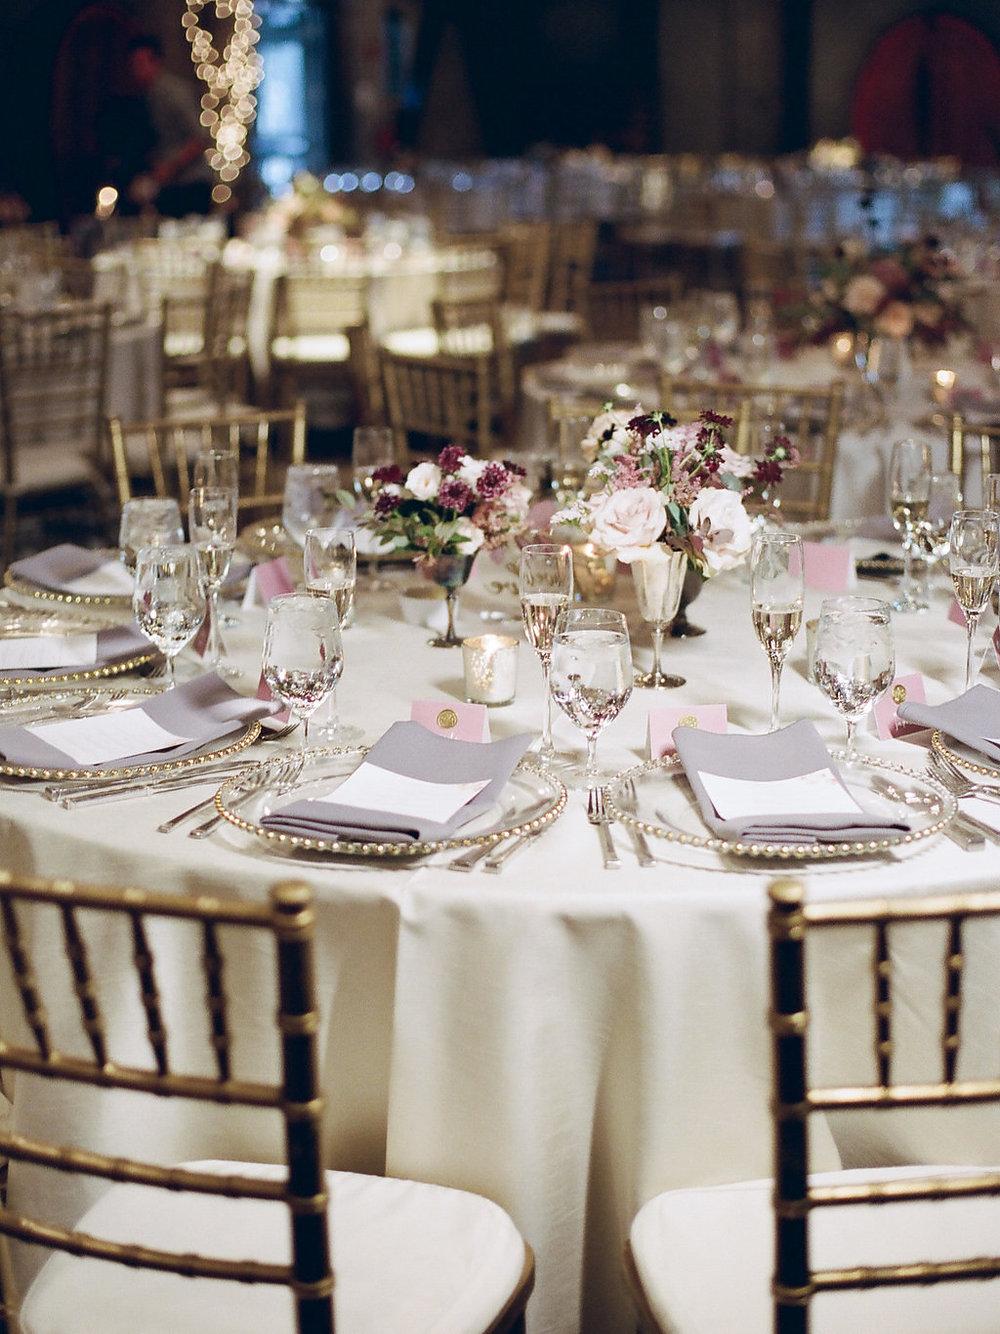 mountain-winery-wedding-reception-JennySoiPhotography.jpg